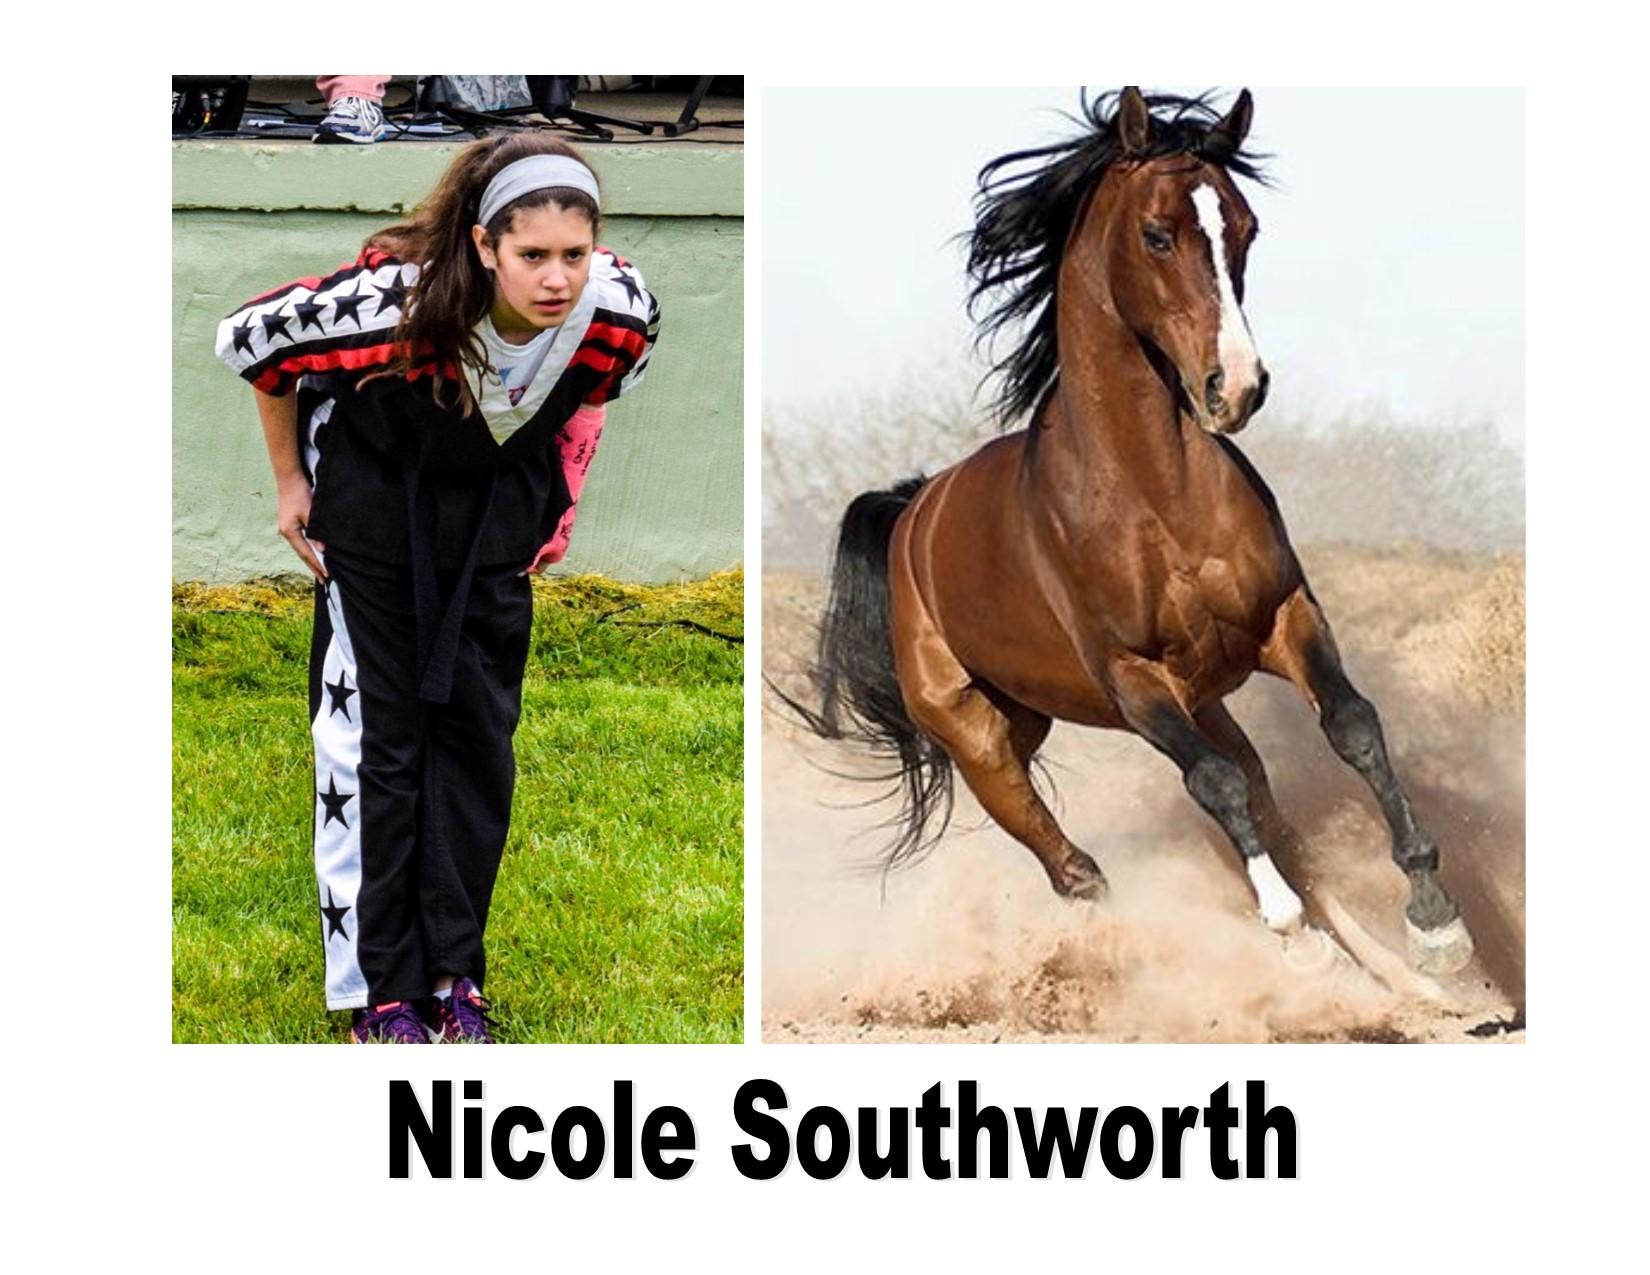 nicole southworth spirit animal horse.jpg